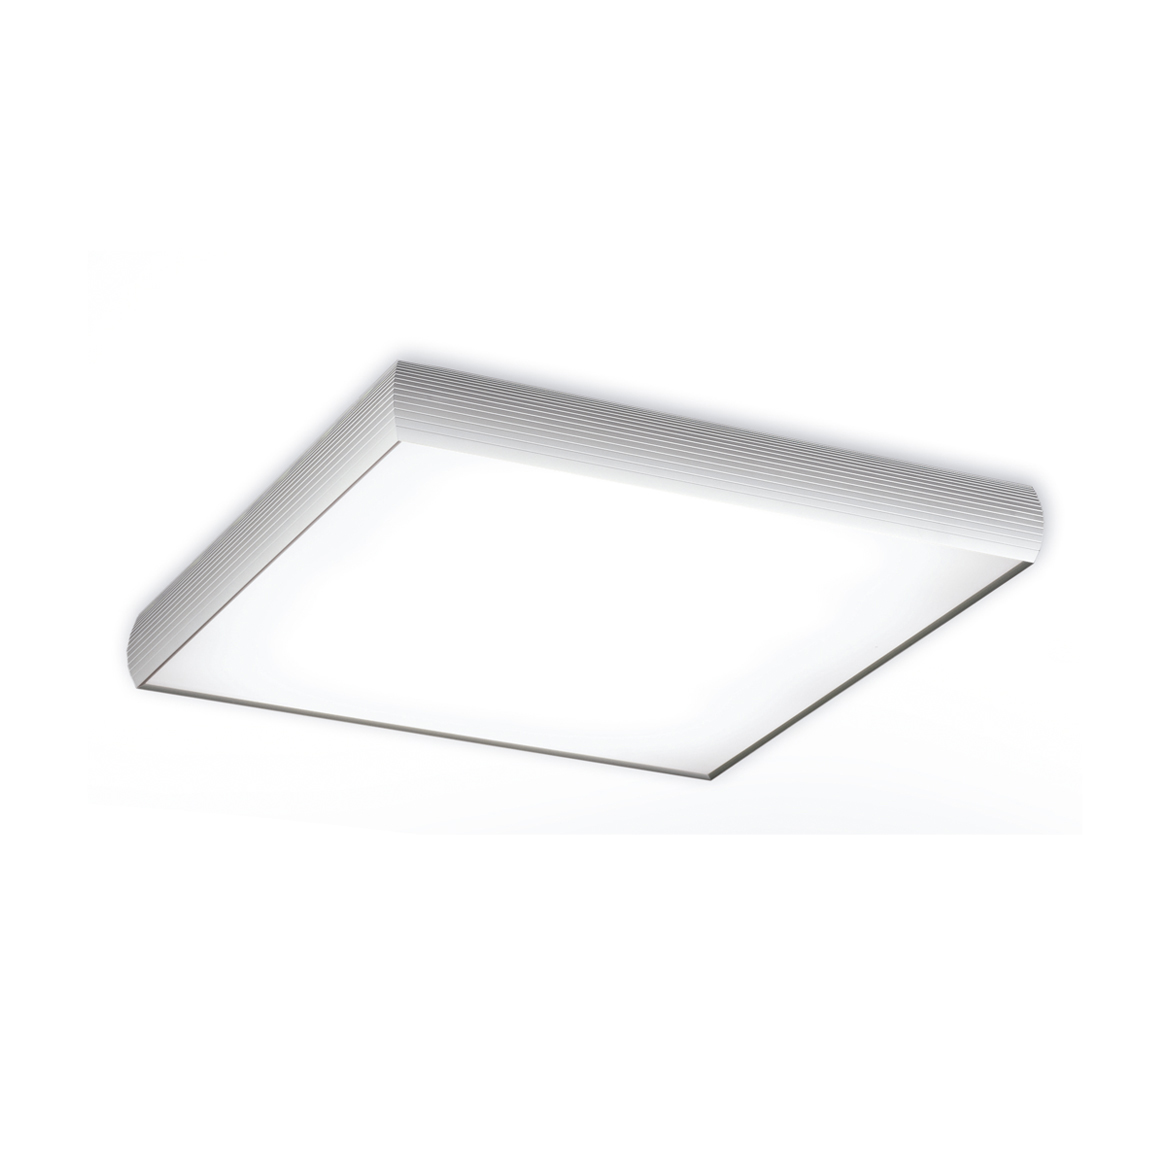 Aluminium ceiling lamp ELECTRON.4xE27 20w